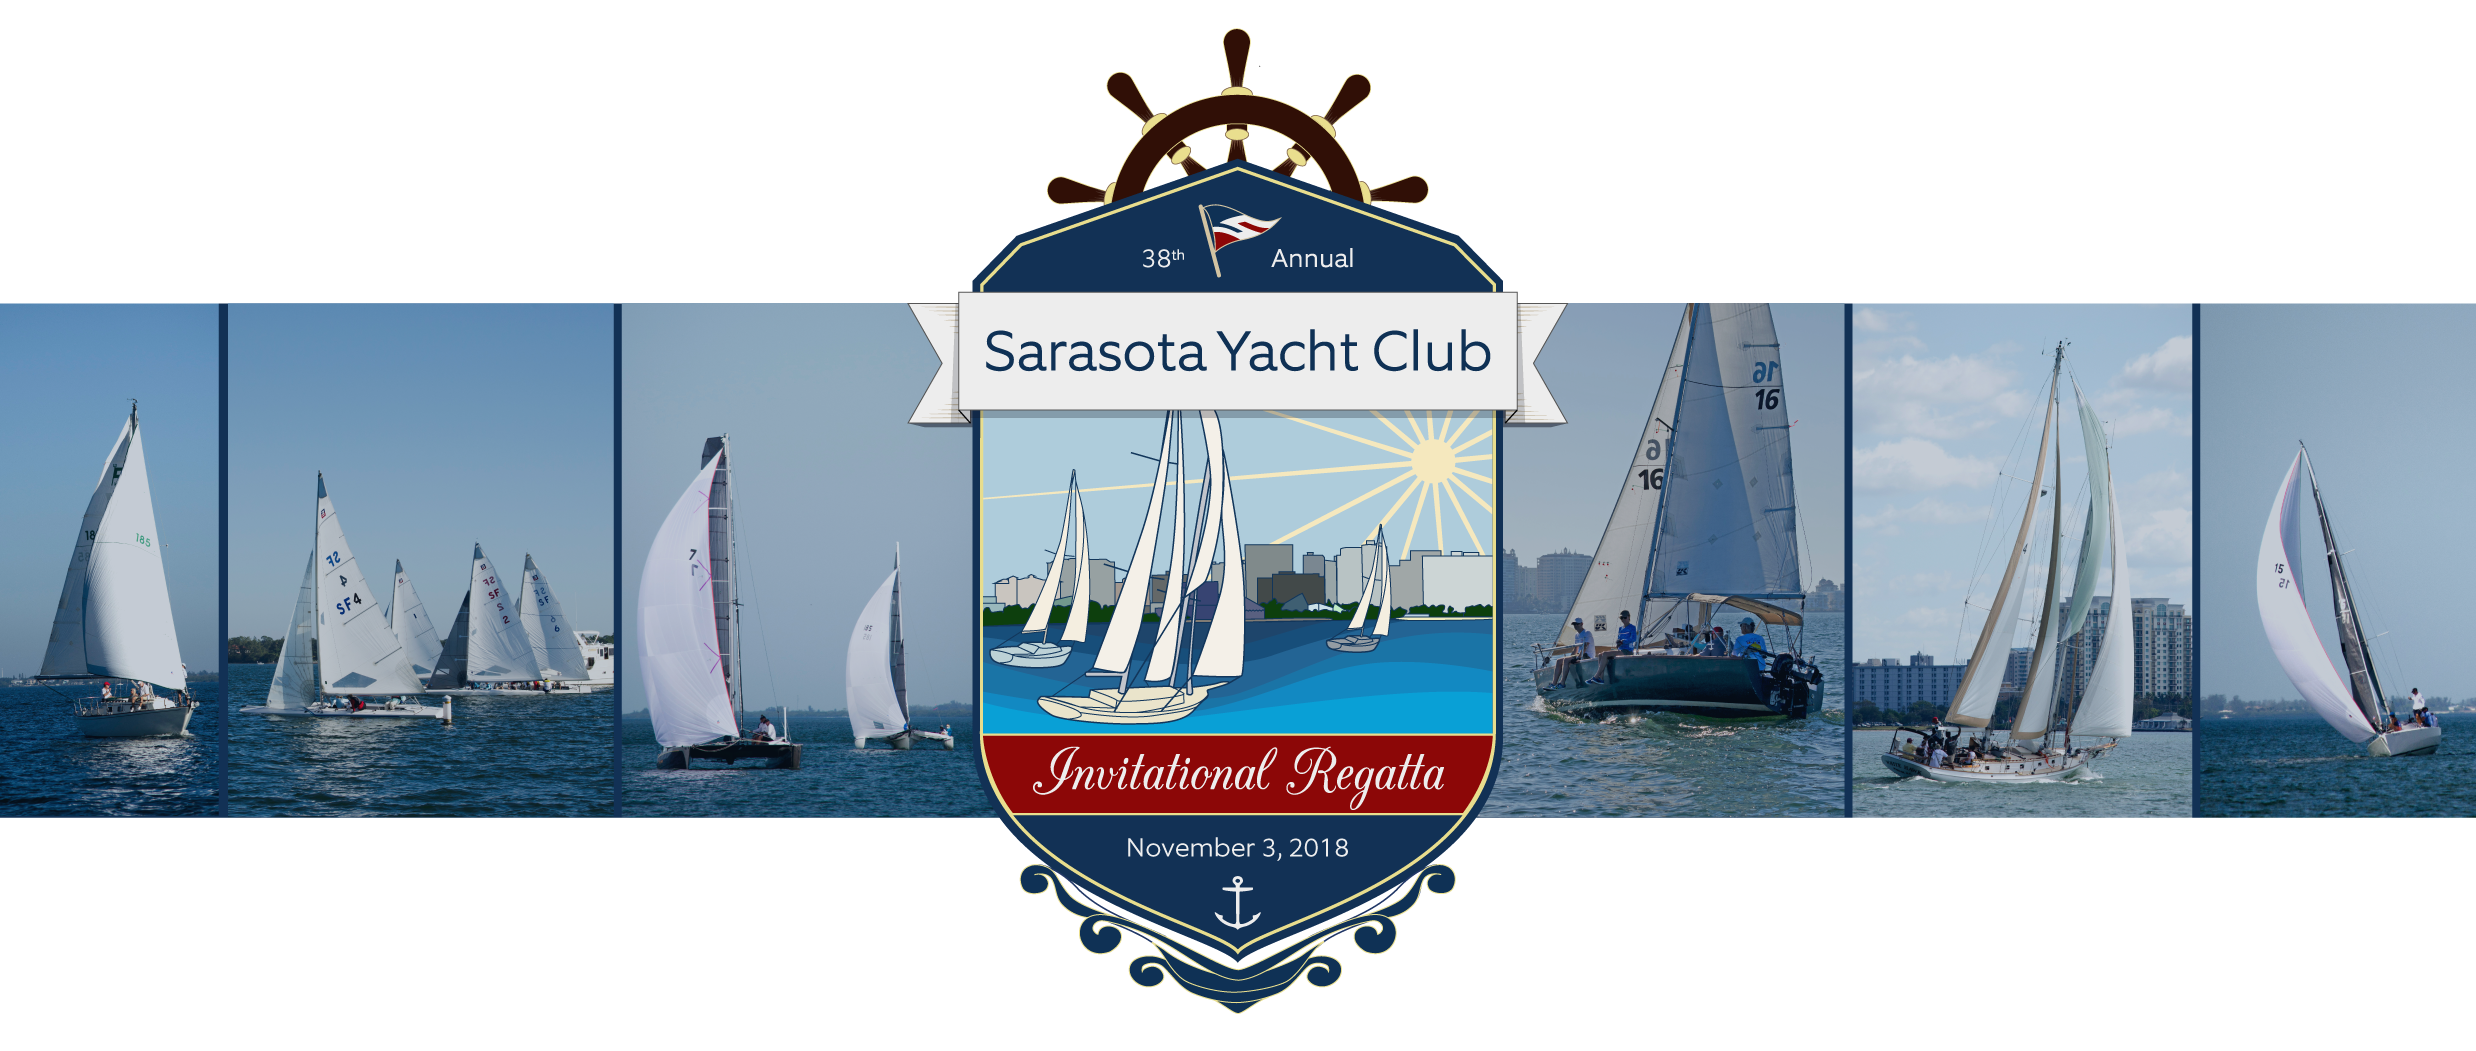 Sarasota Yacht Club >> Sarasota Yacht Club Regatta